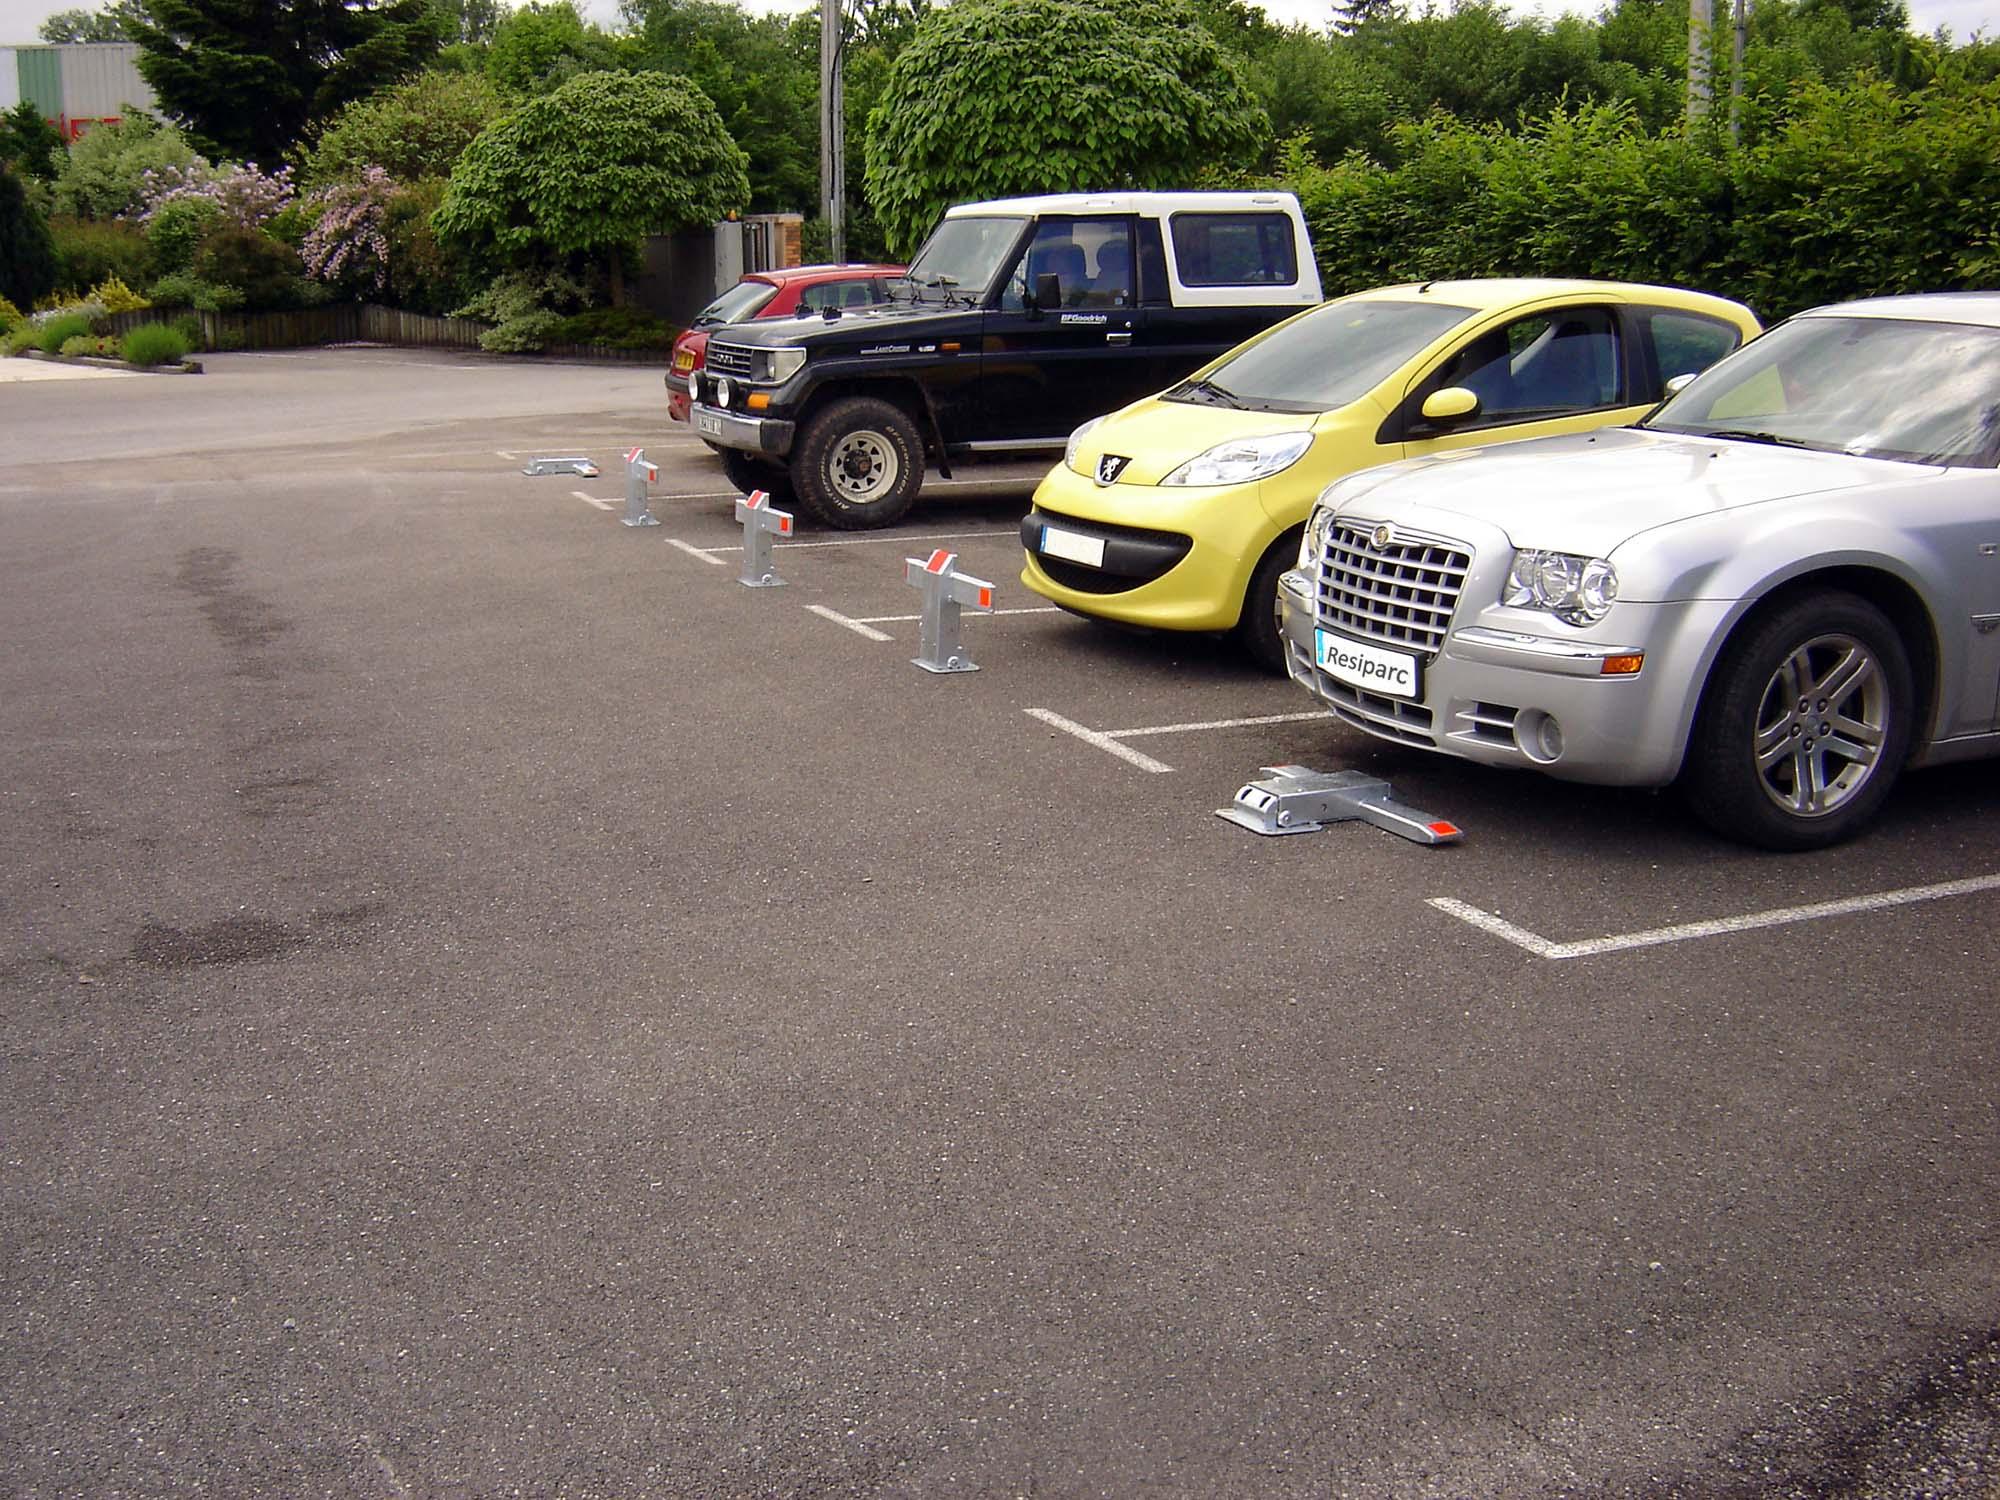 brasier-industrie-resiparc-mise-en-situation-image-plusieurs-voitures-parking